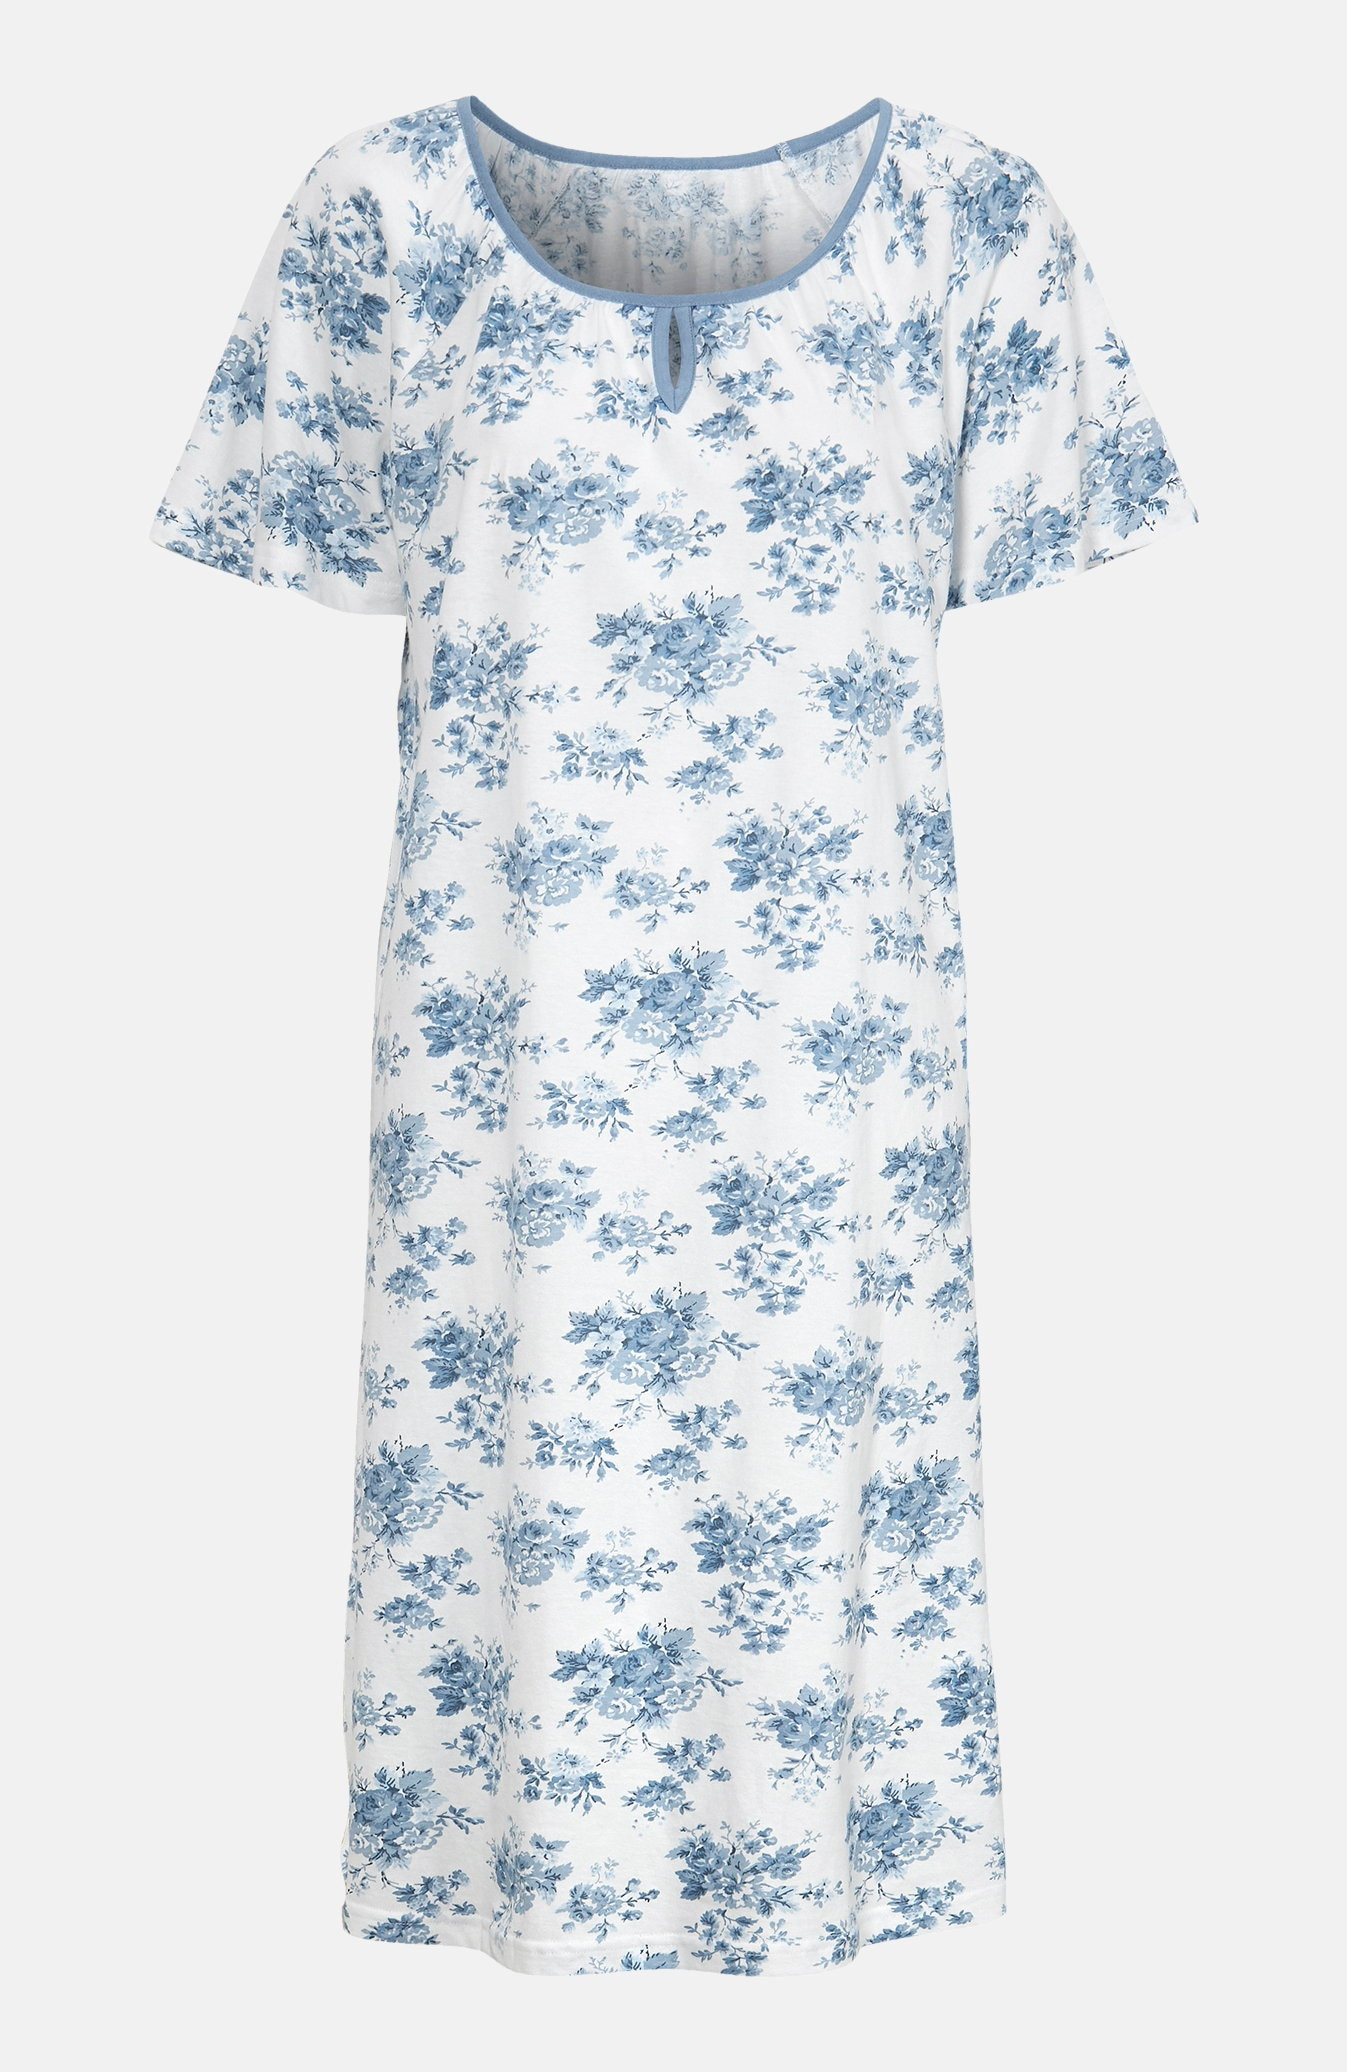 Koszula nocna zkrótkim rękawem